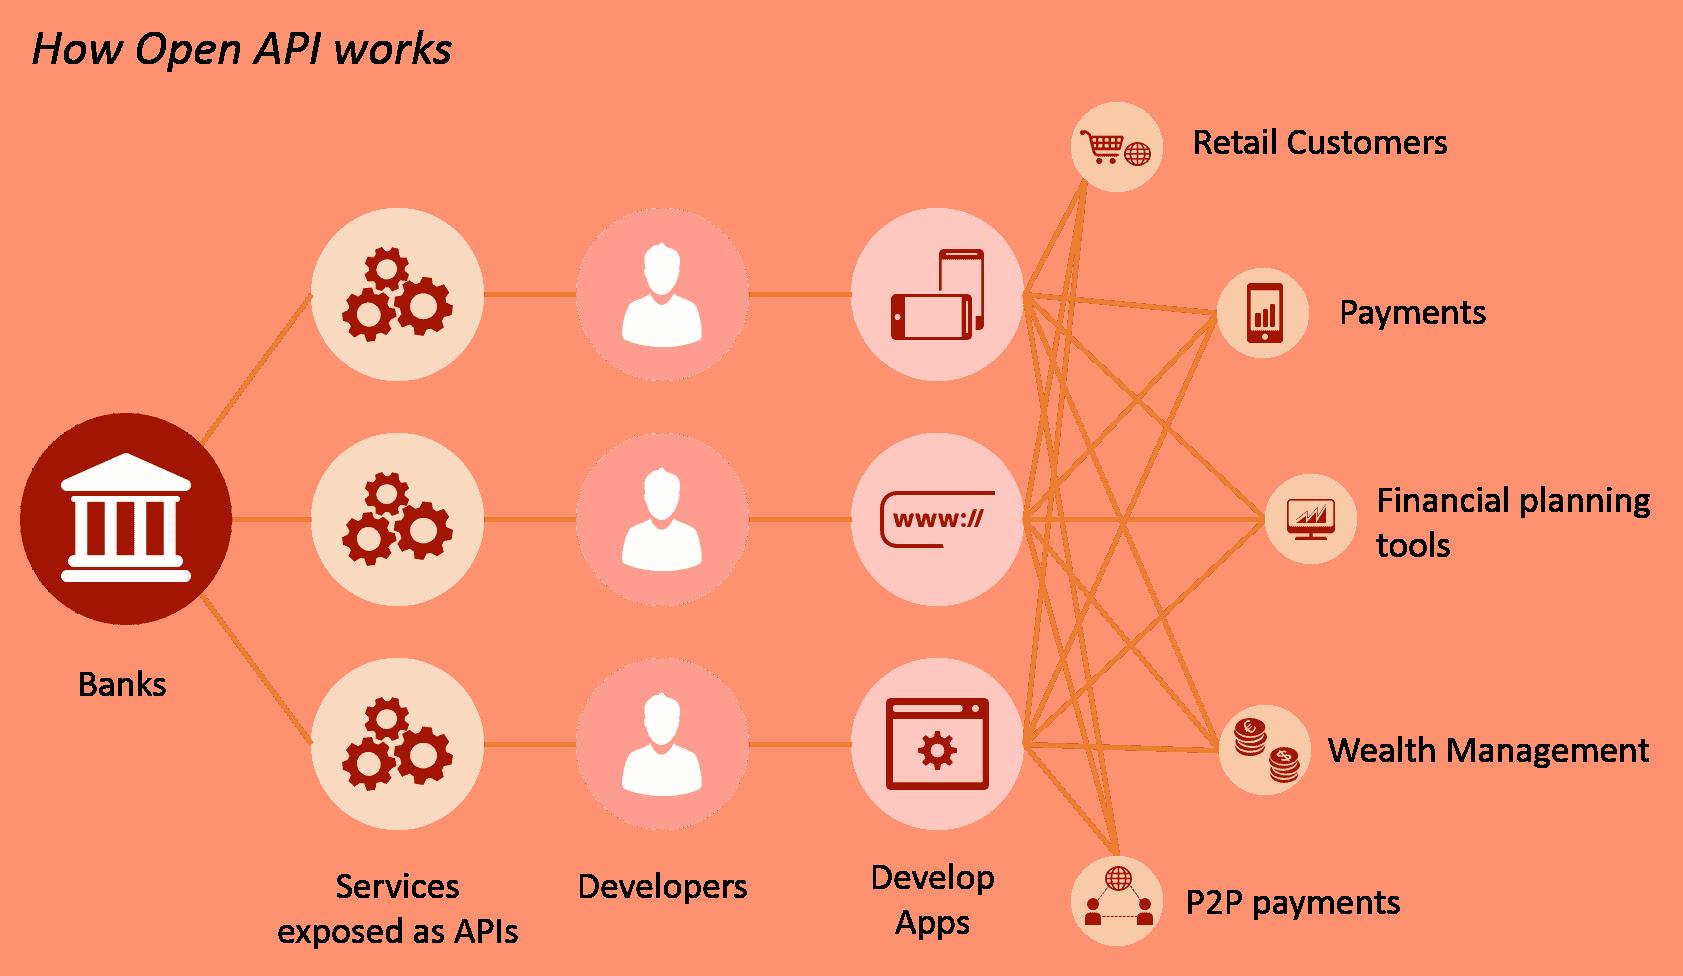 ekosistem open banking